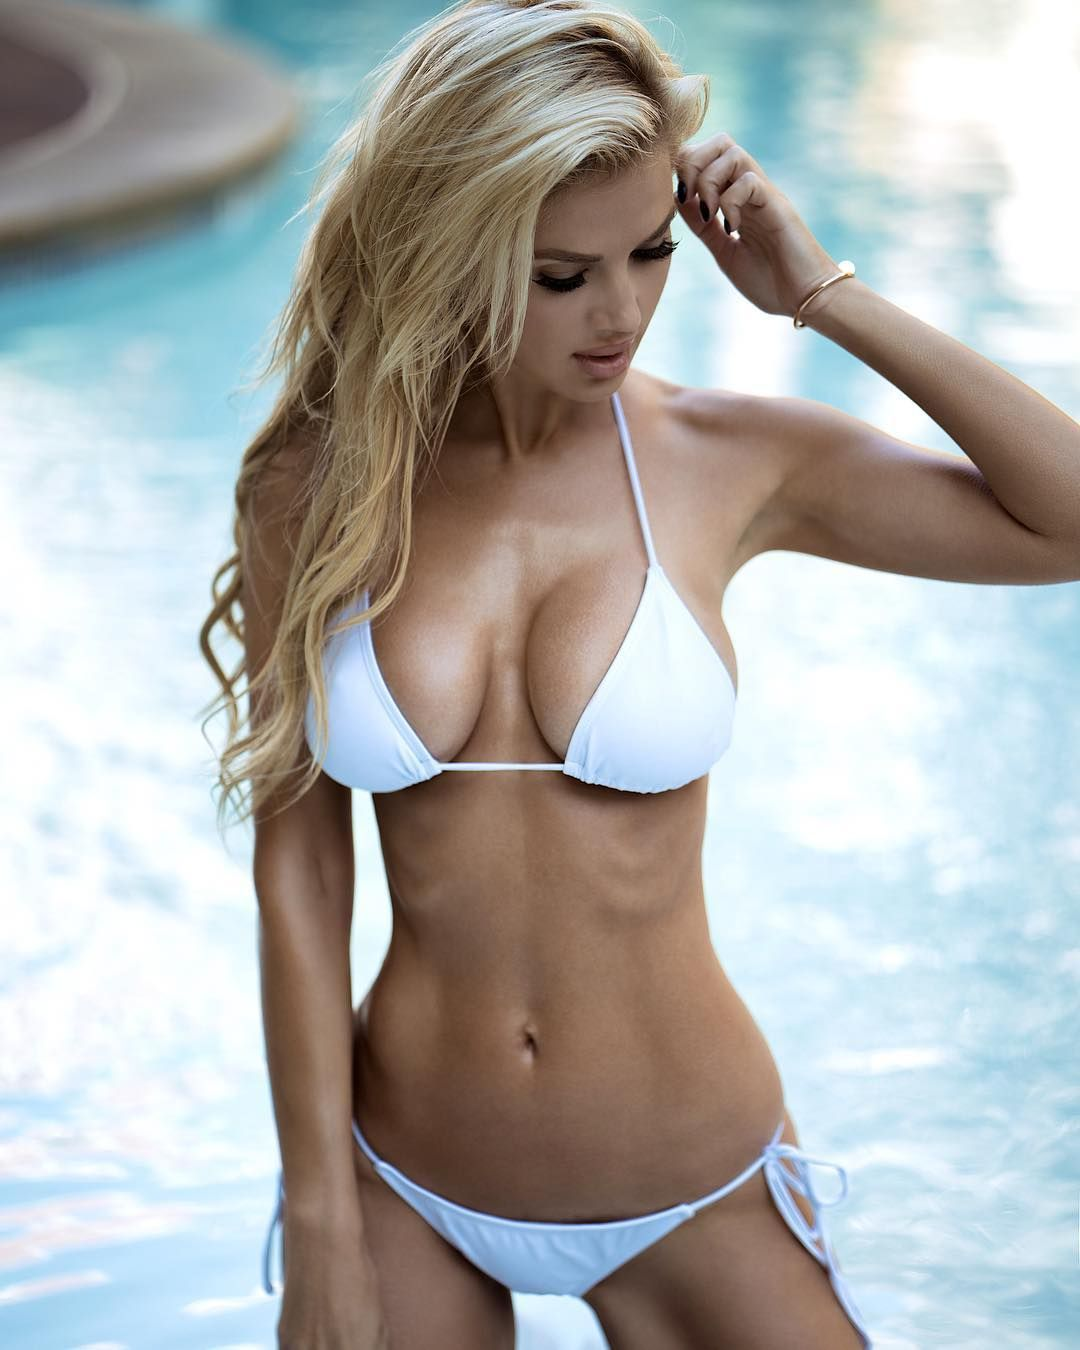 Hanna montana illy nuda